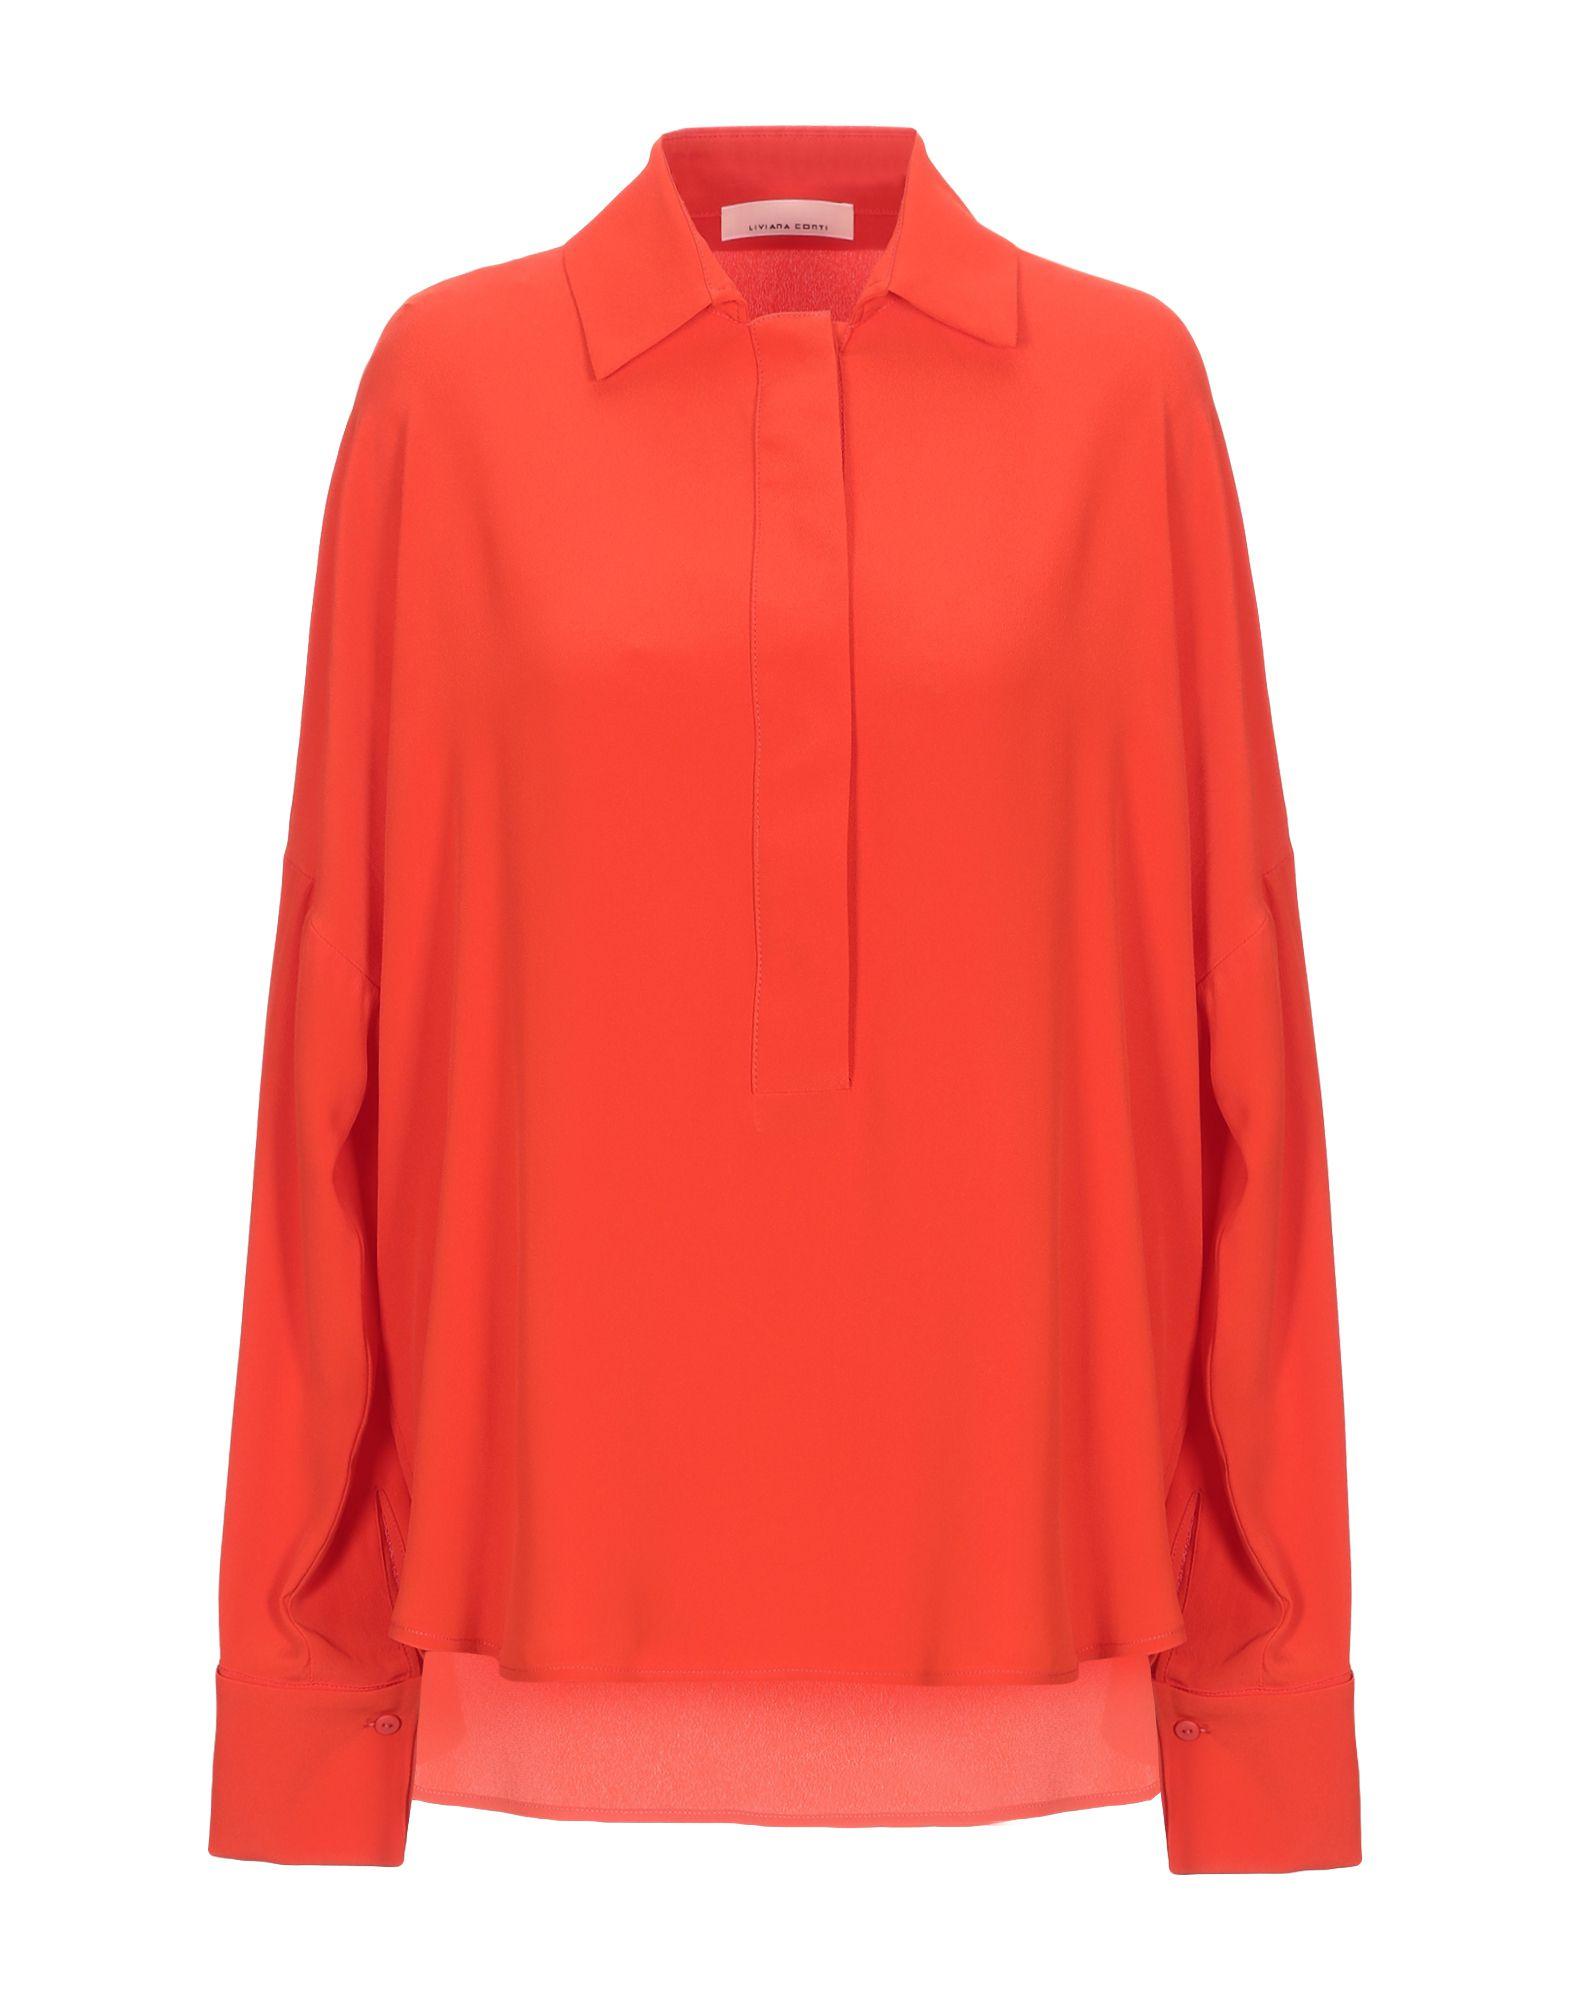 LIVIANA CONTI Блузка liviana conti блузка